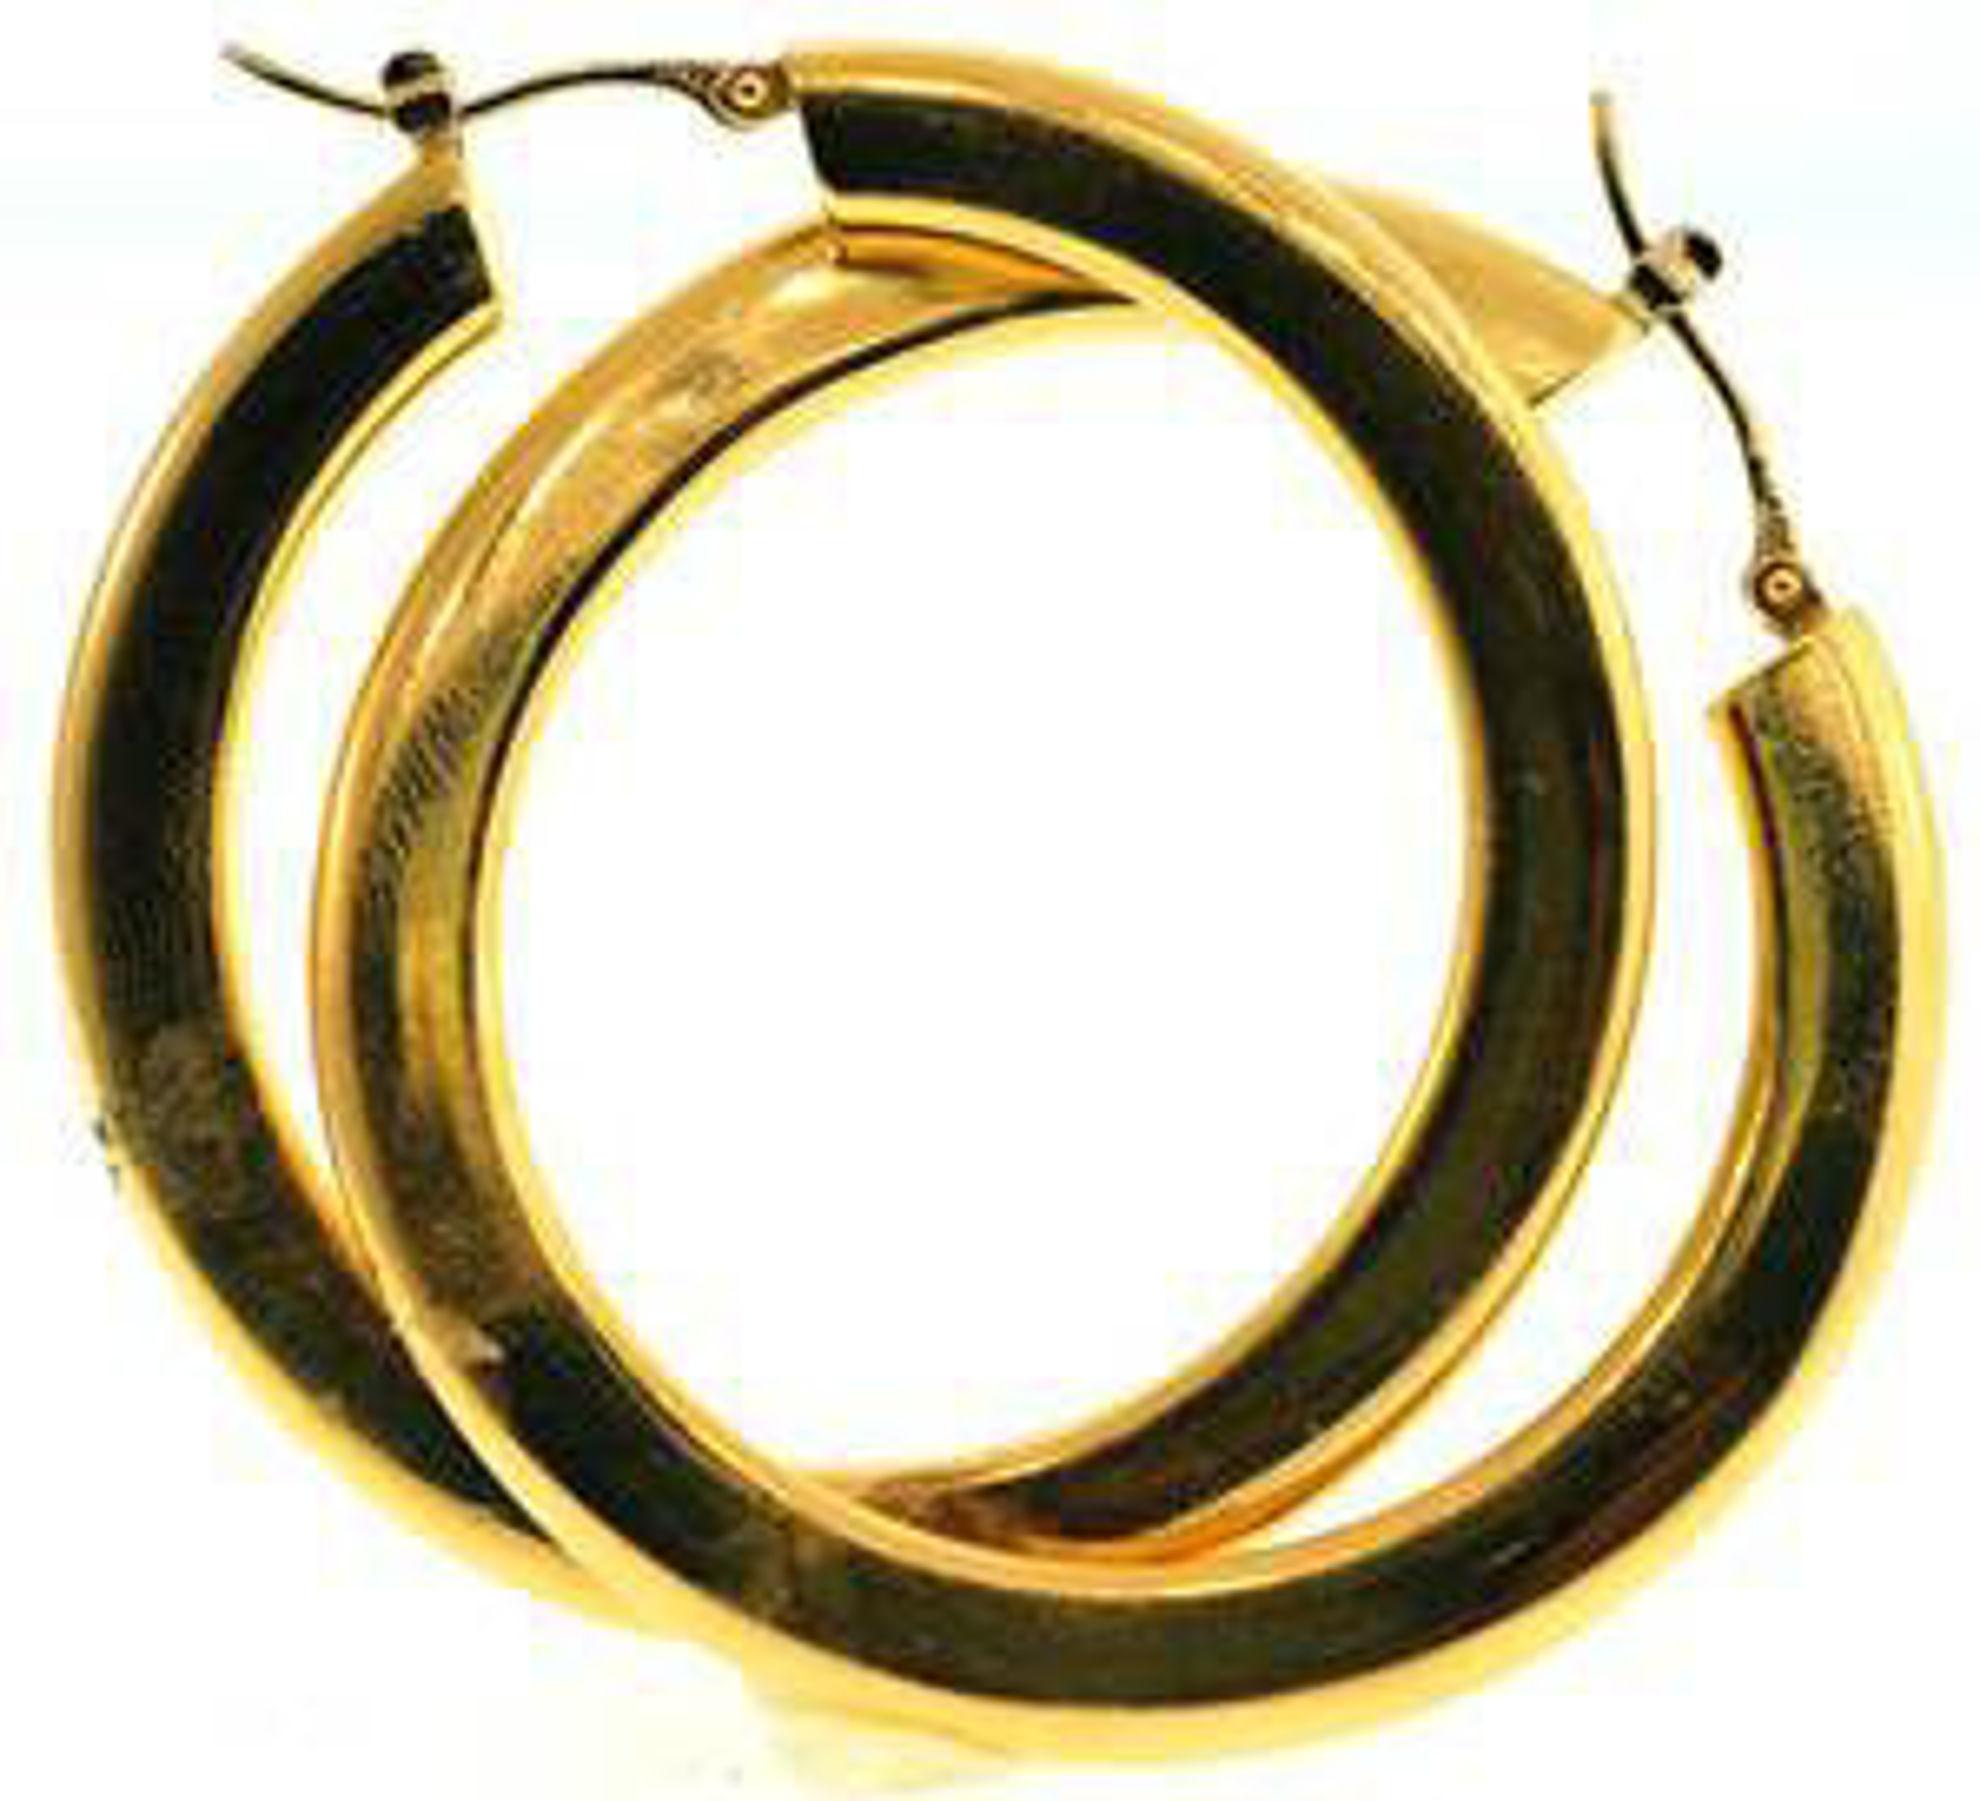 Picture of Earrings 18kt-7.1 DWT, 11.0 Grams